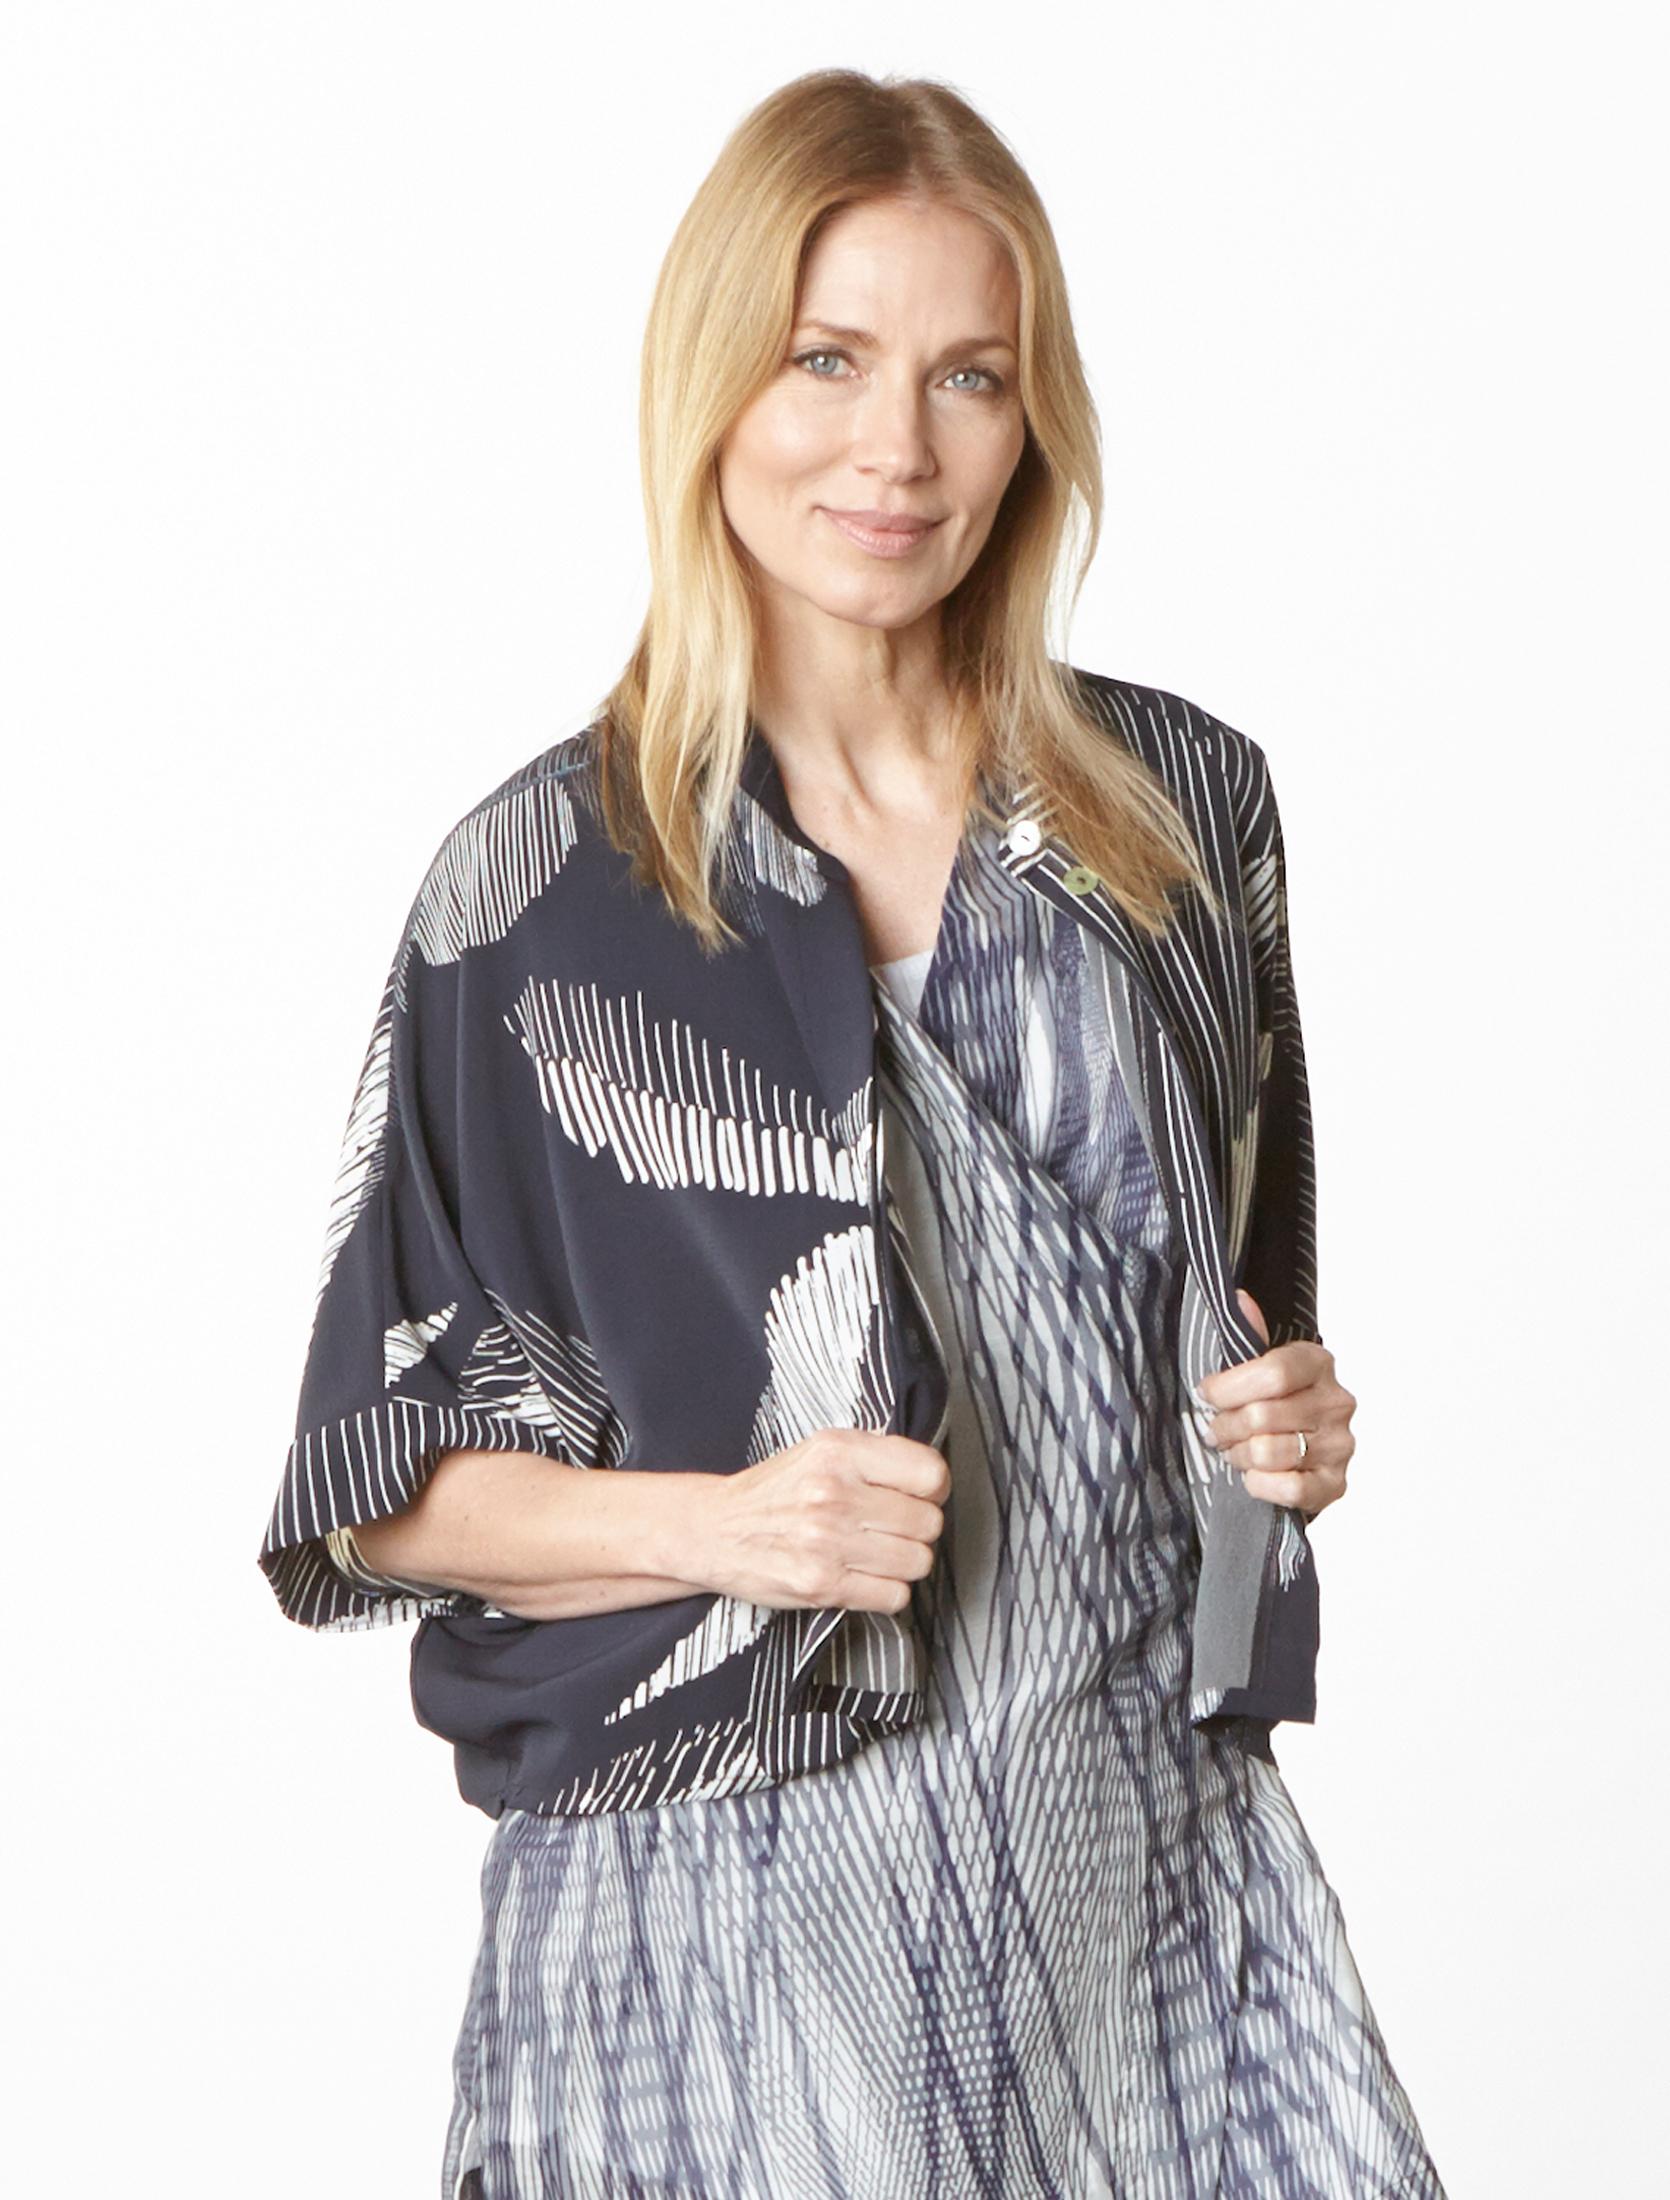 Joe Shirt in lndaco Italian Foglia Print, Freja Cardigan in Netto Italian Cotton/Silk